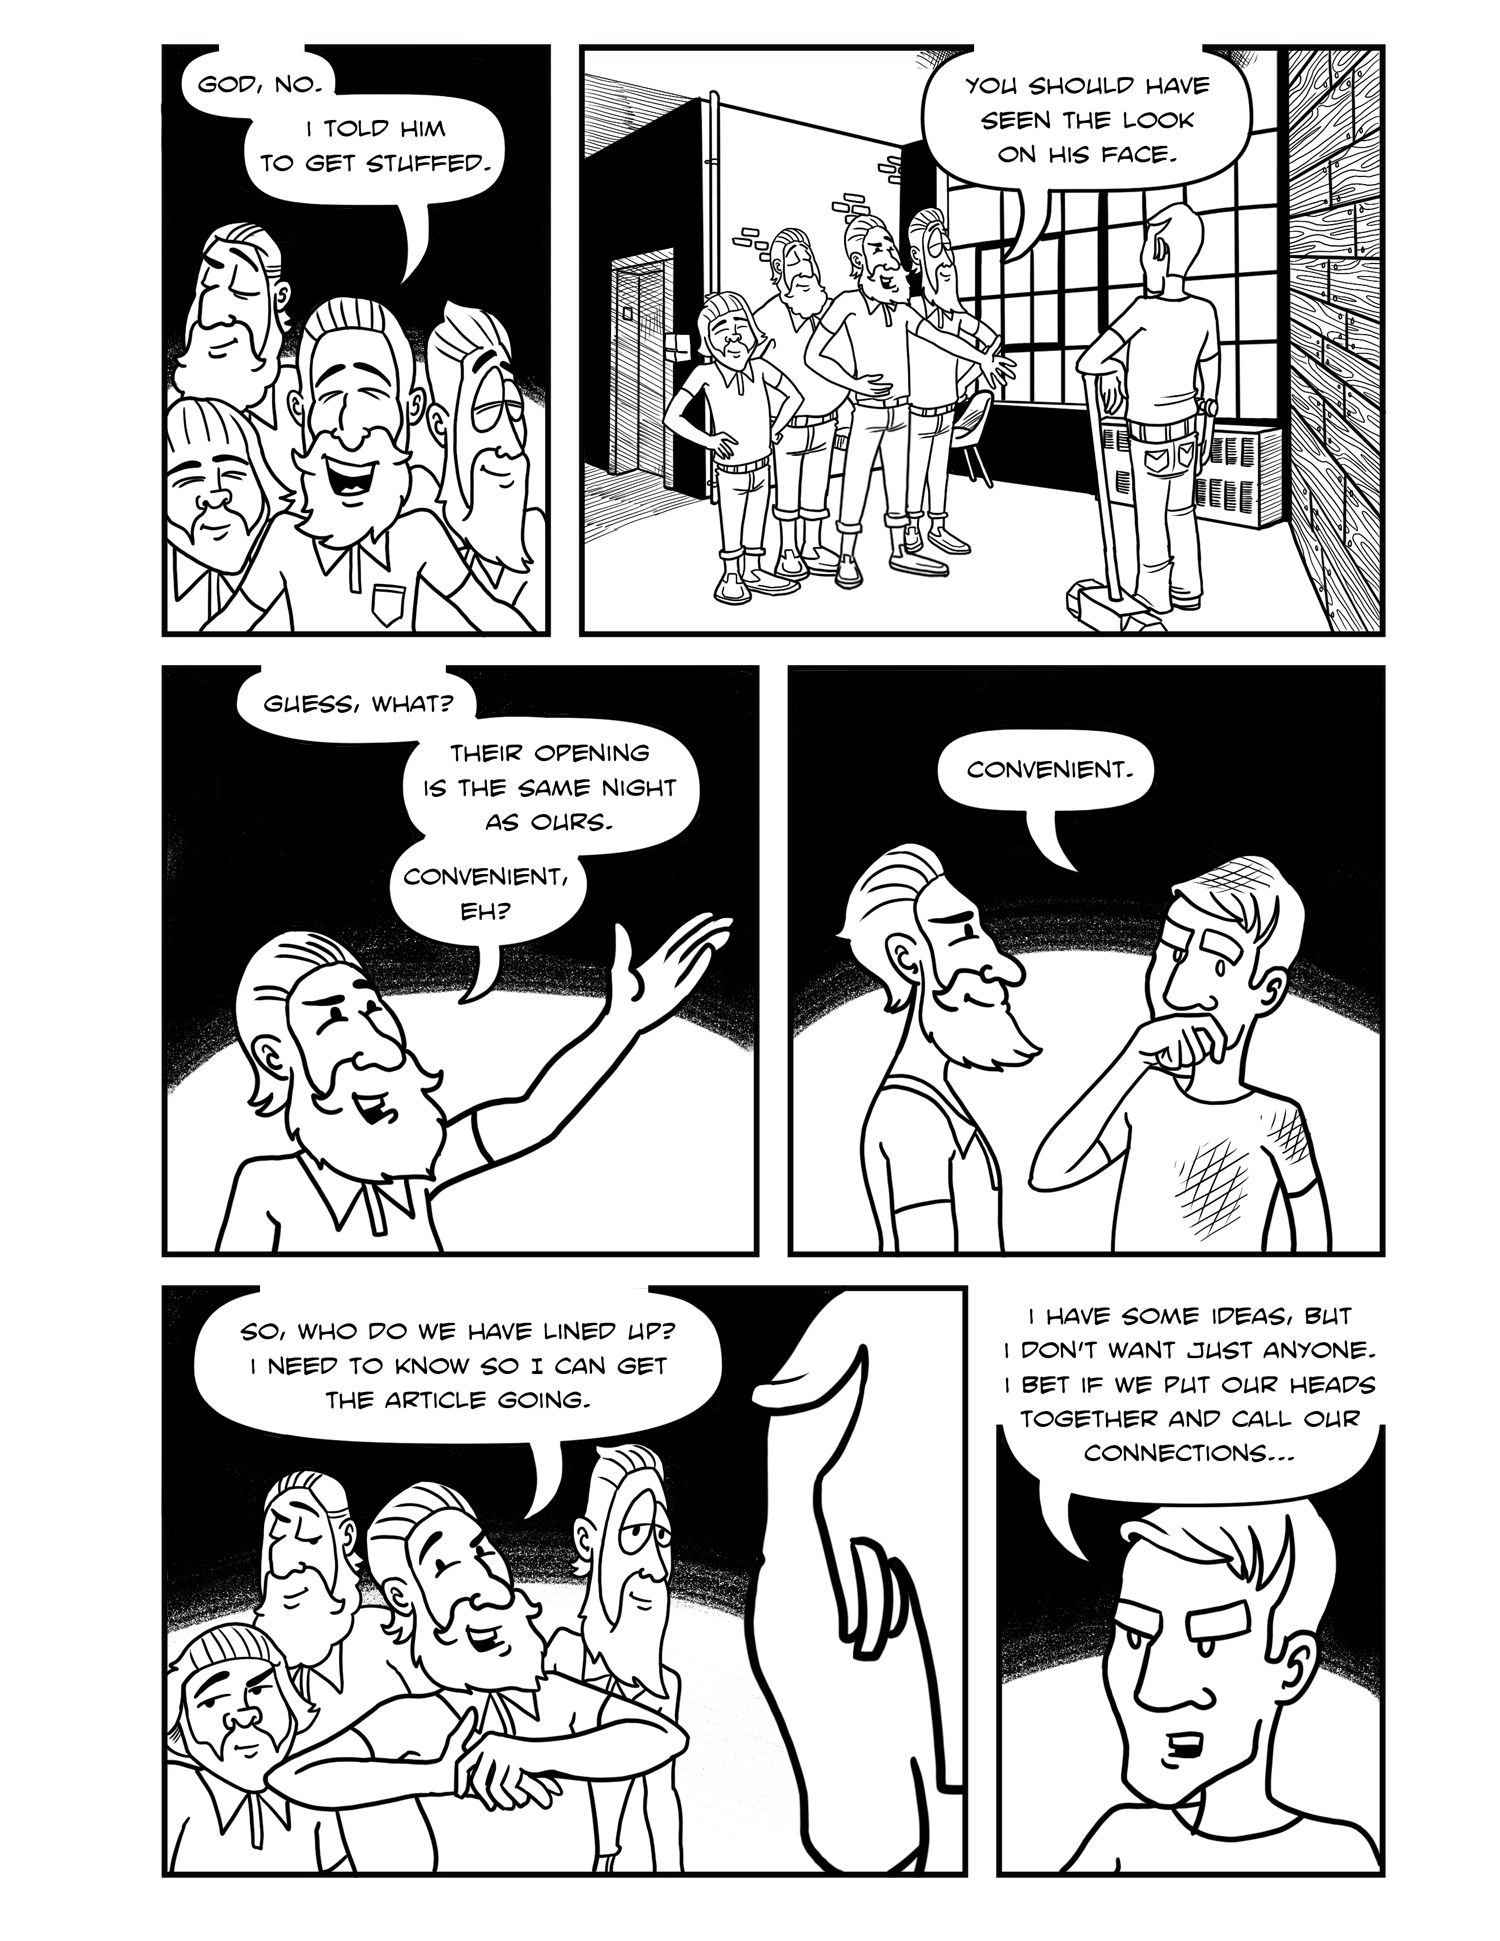 PAGE-338.jpg